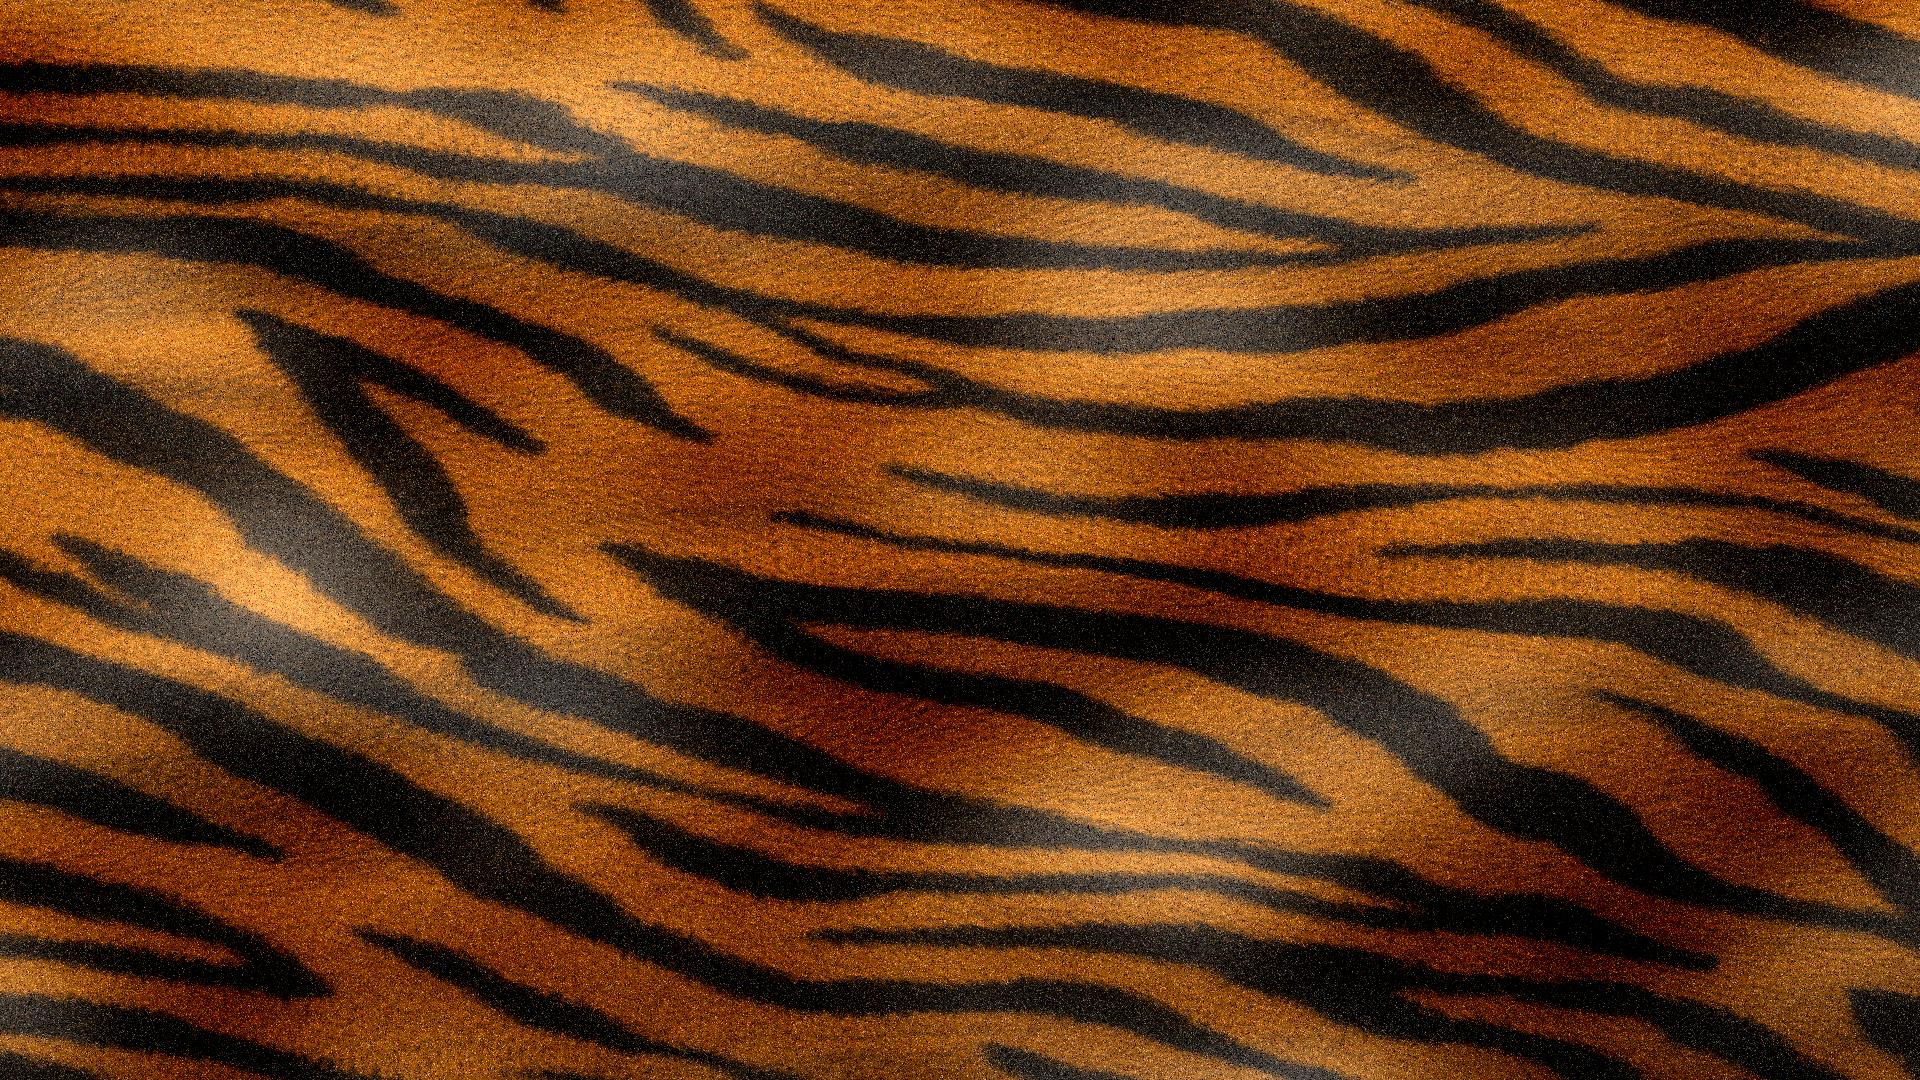 Orange Tiger Texture By Watchmebop Deviantart Com On